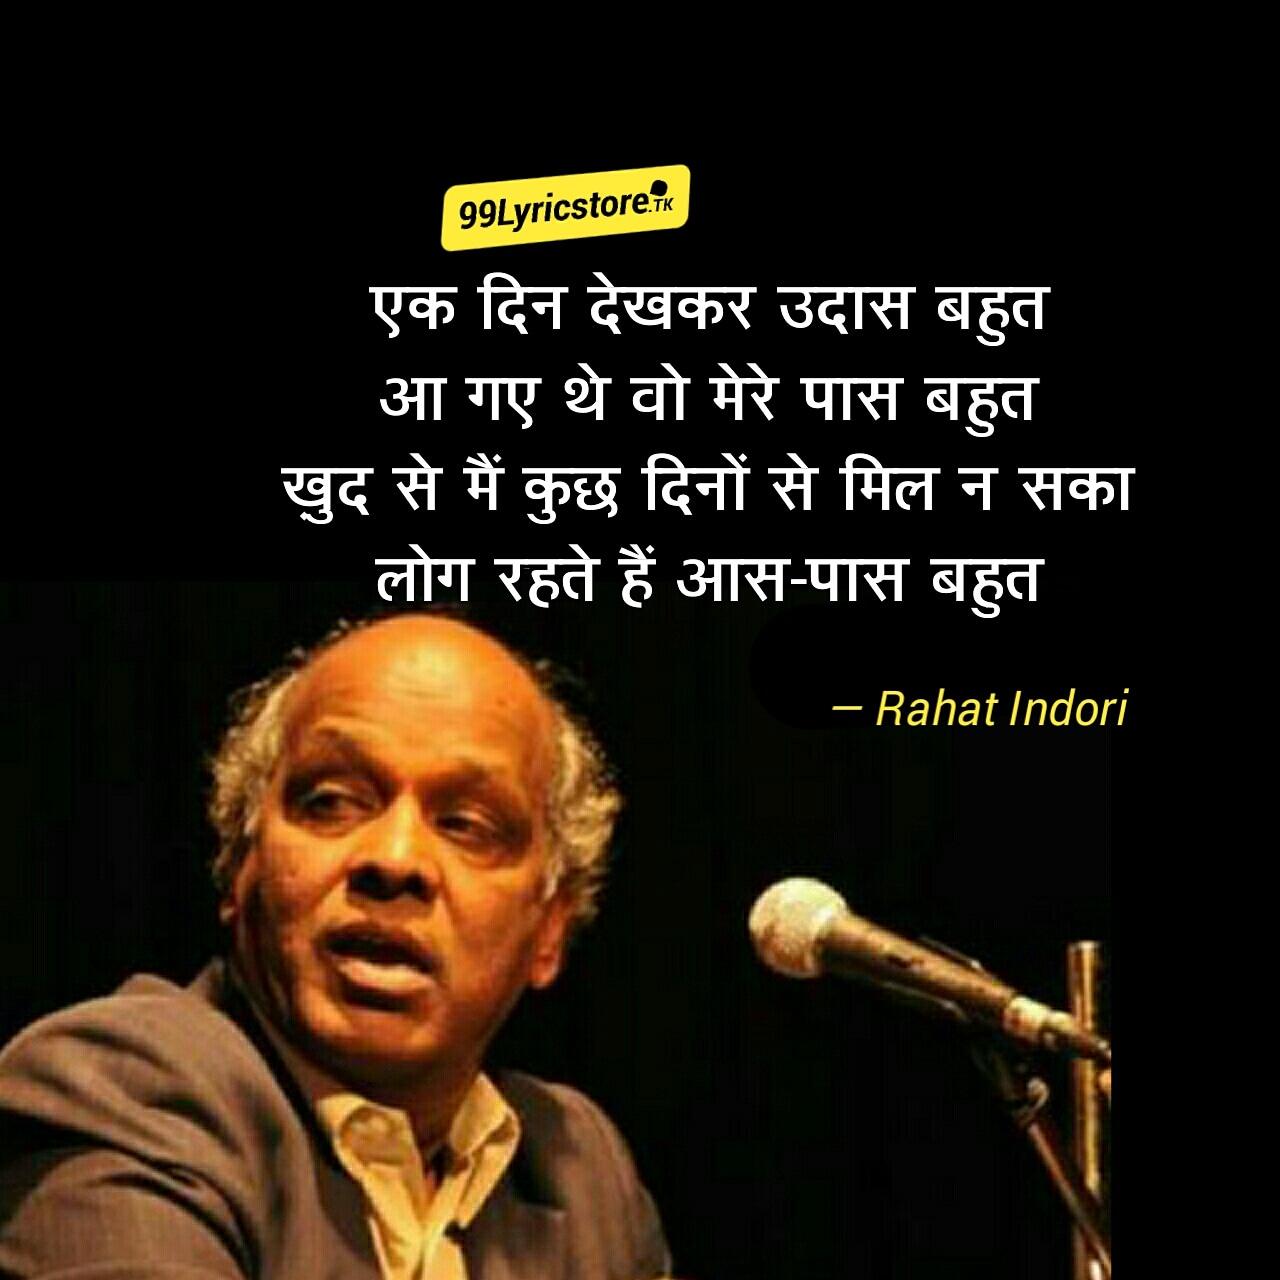 'Ek Din Dekh Kar Udaas Bahut' written and performed by Rahat Indori. This poetry is best Ghazal and Shayari of Rahat Indori.